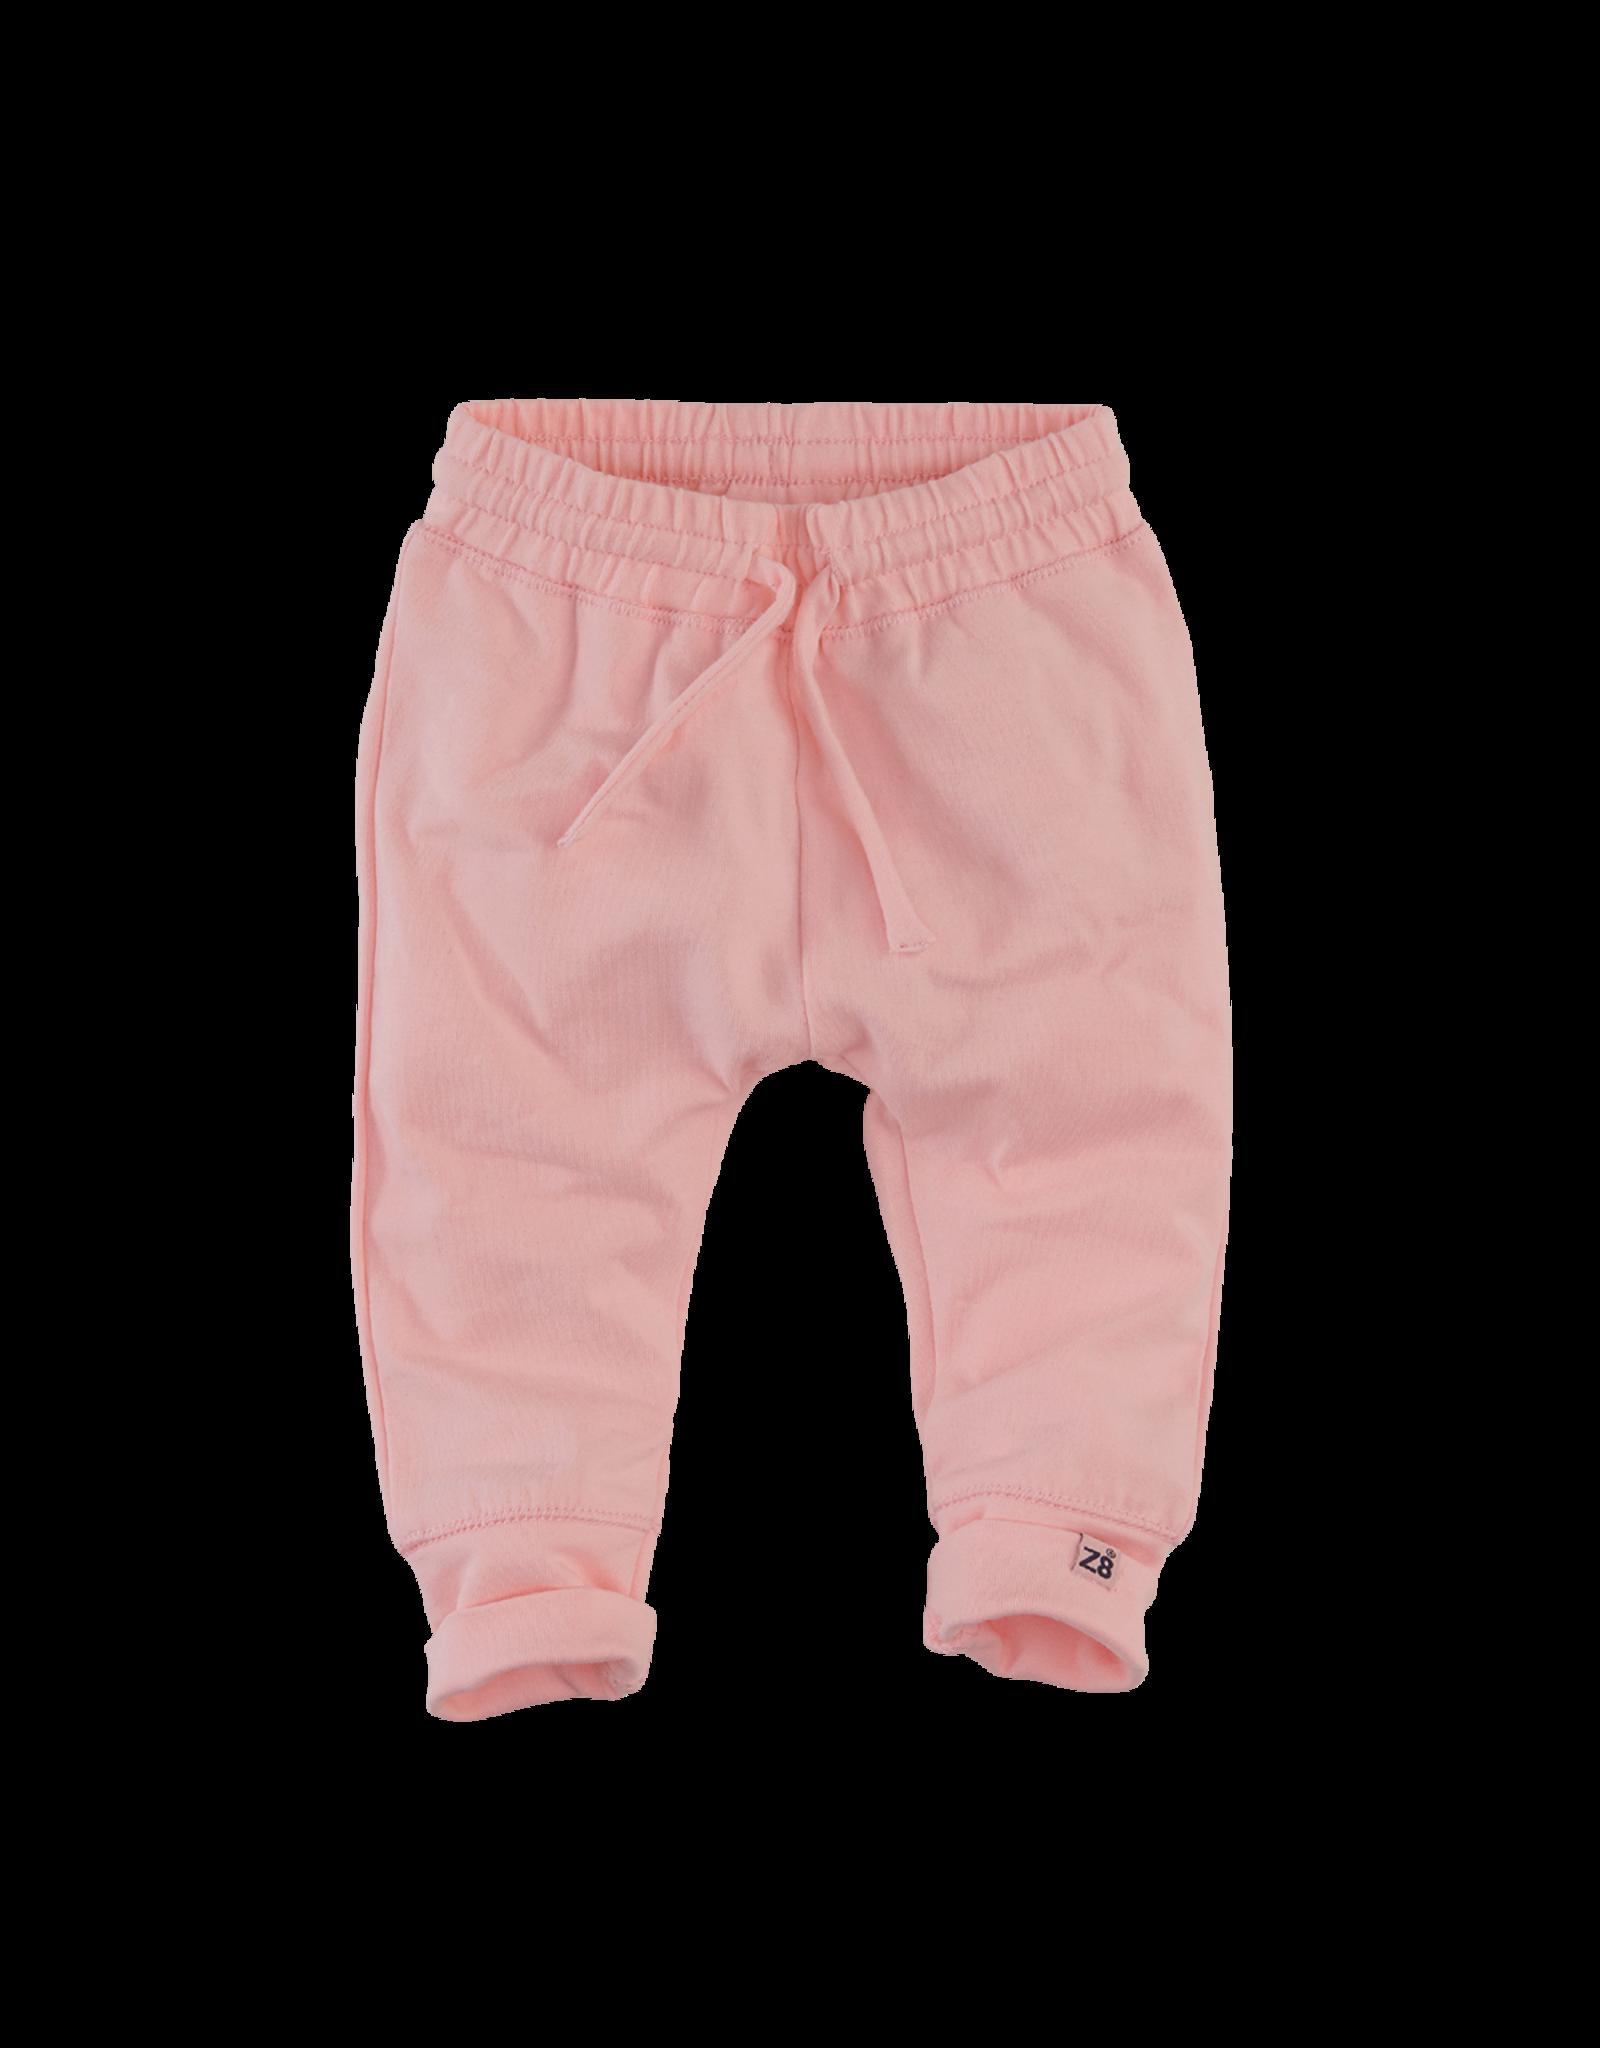 Z8 Dodo N19 Soft pink NOS